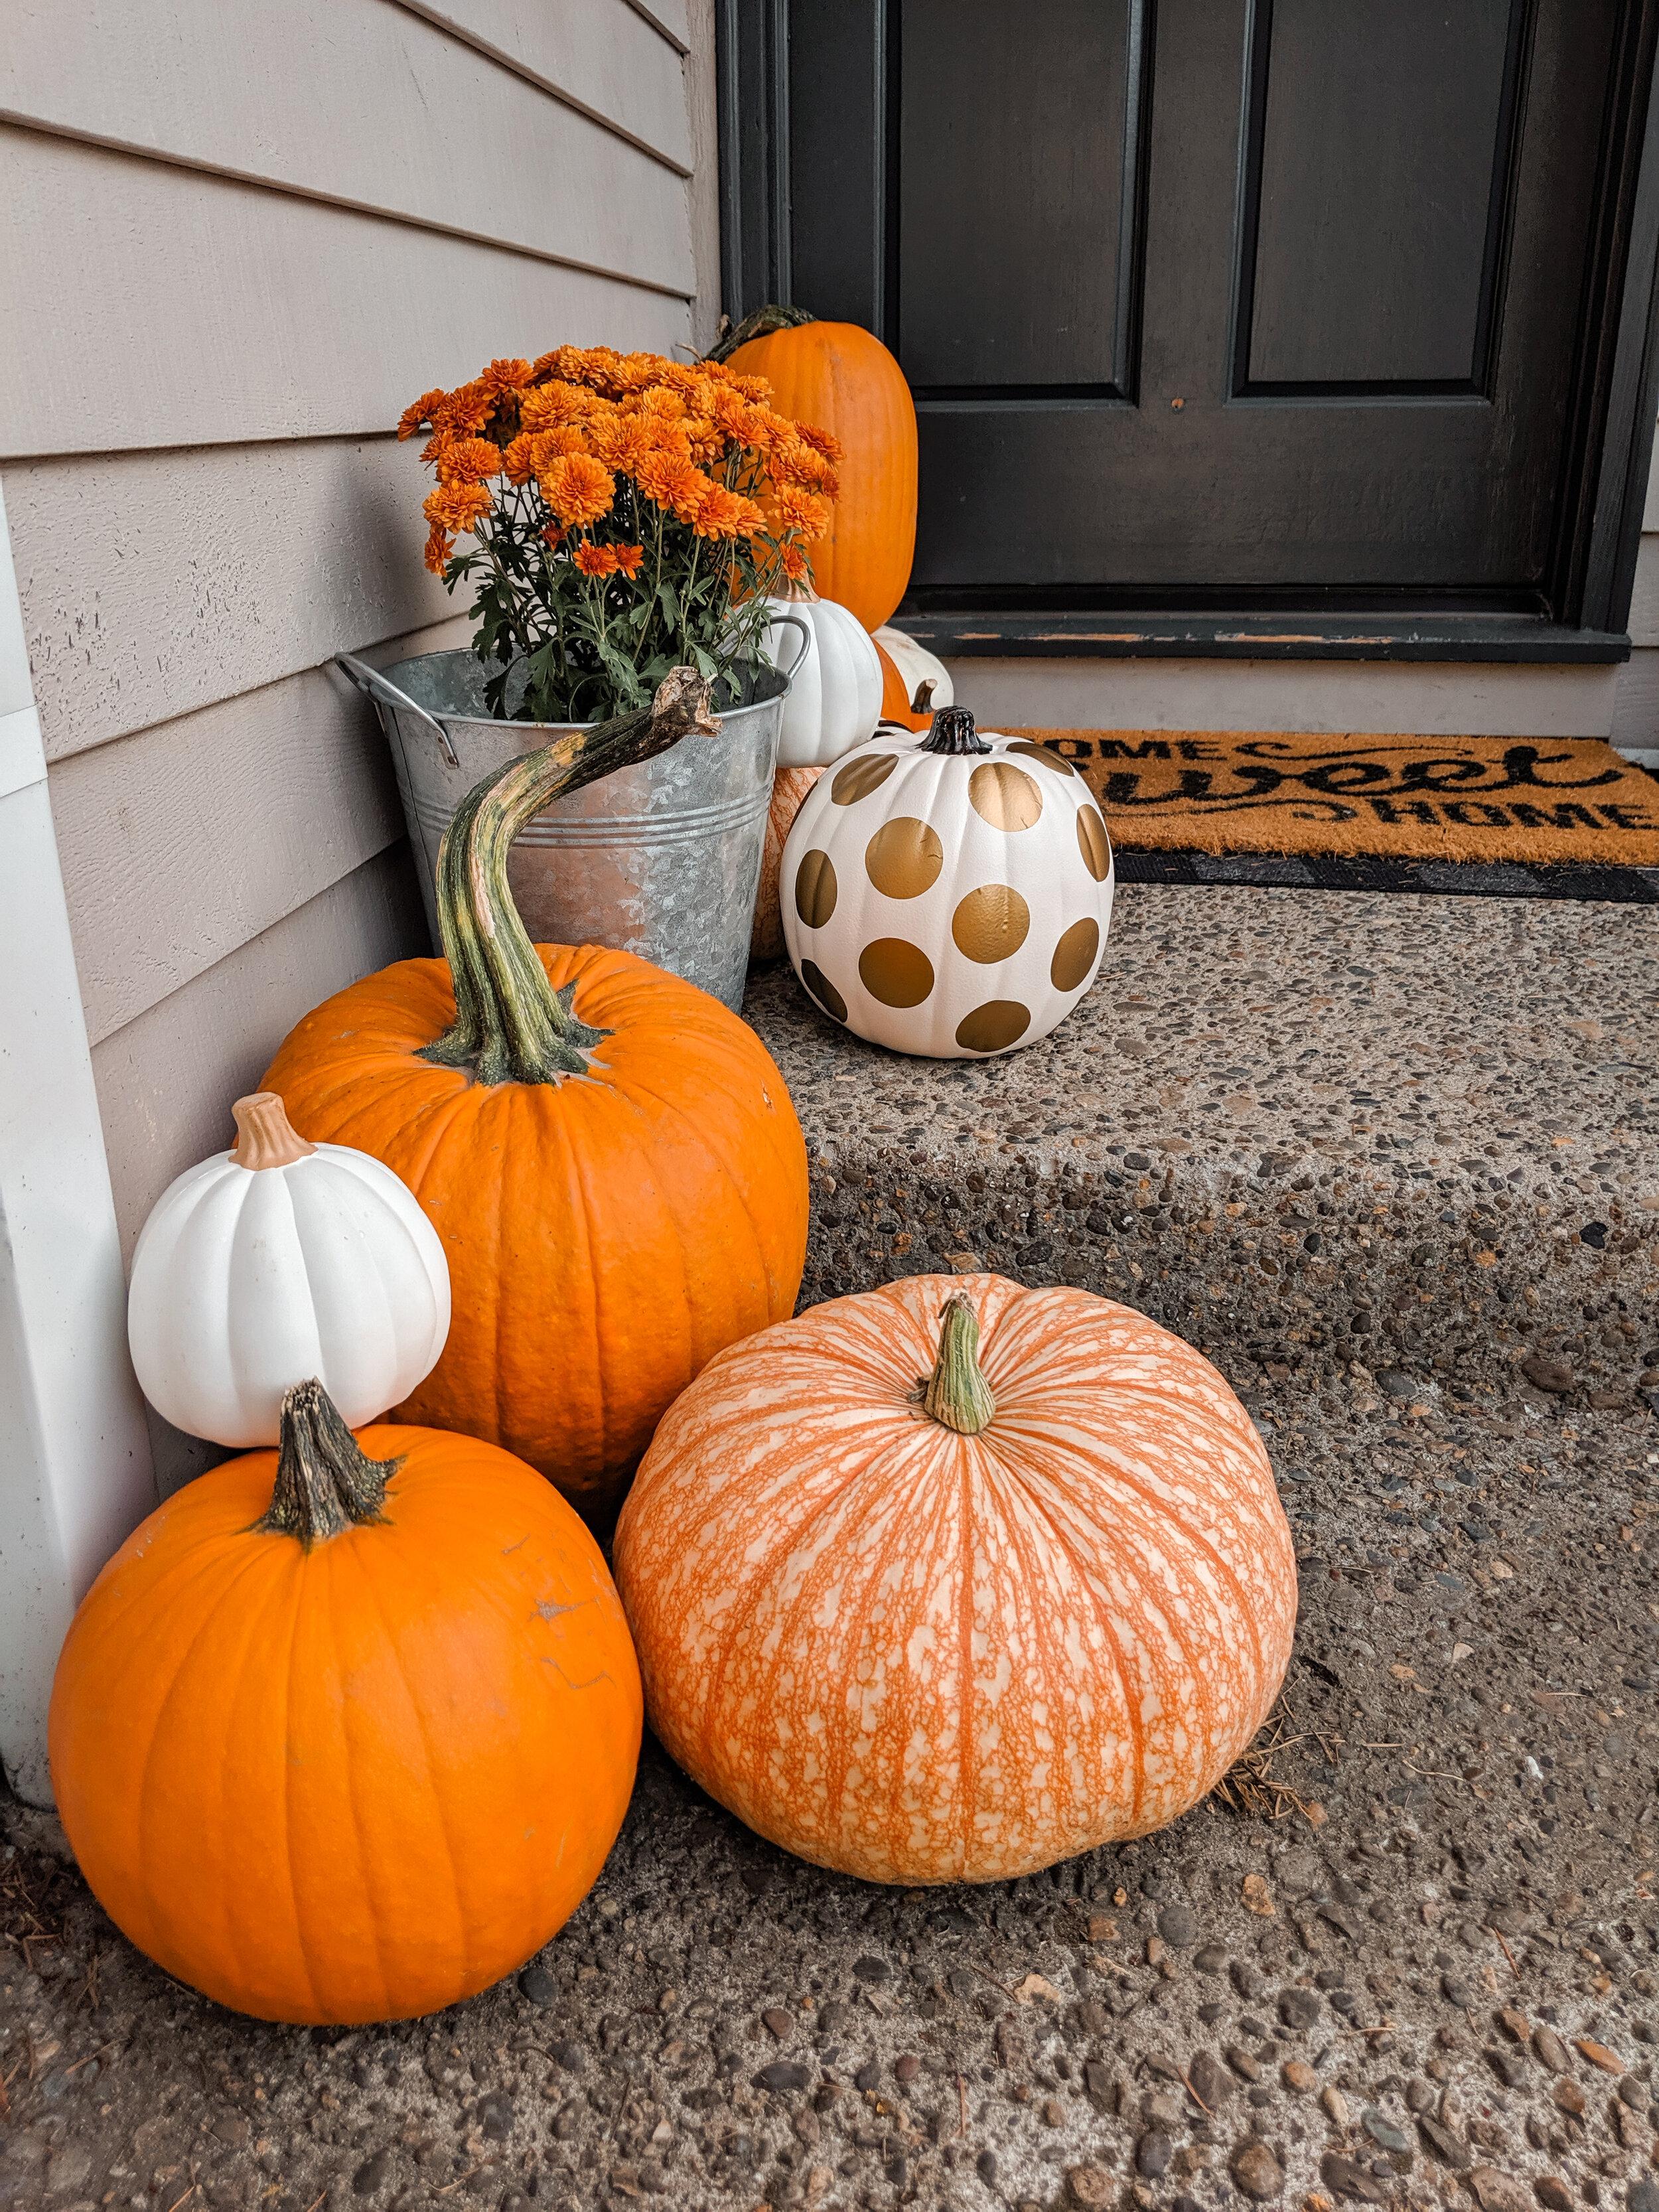 Fall Front Door Decorations for Halloween